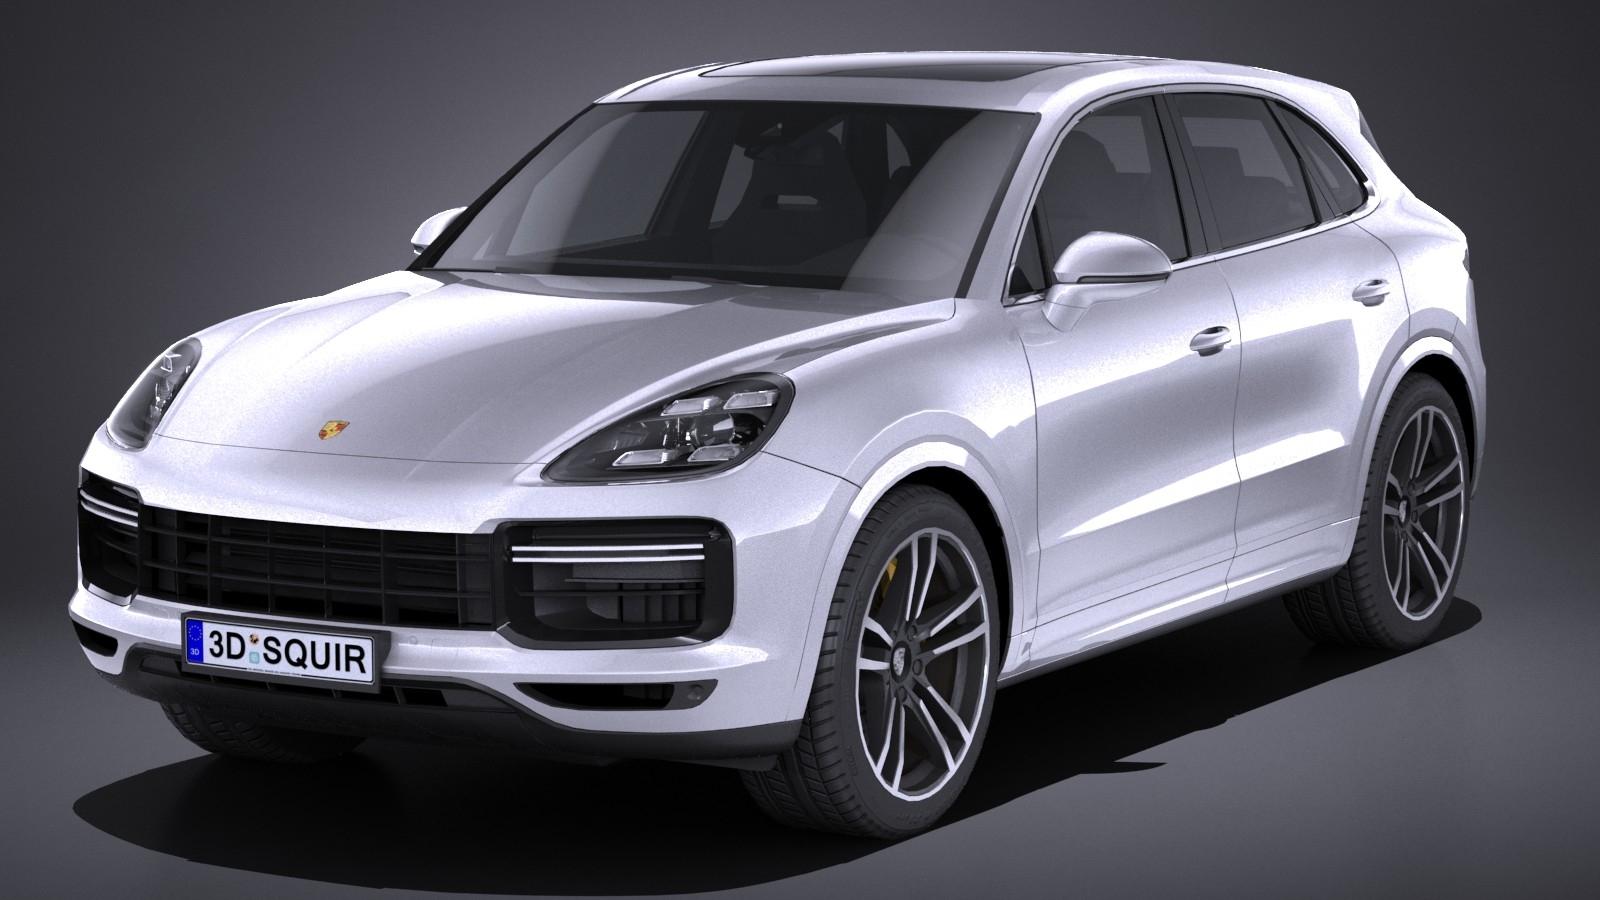 HQ LowPoly Porsche Cayenne Turbo 2018